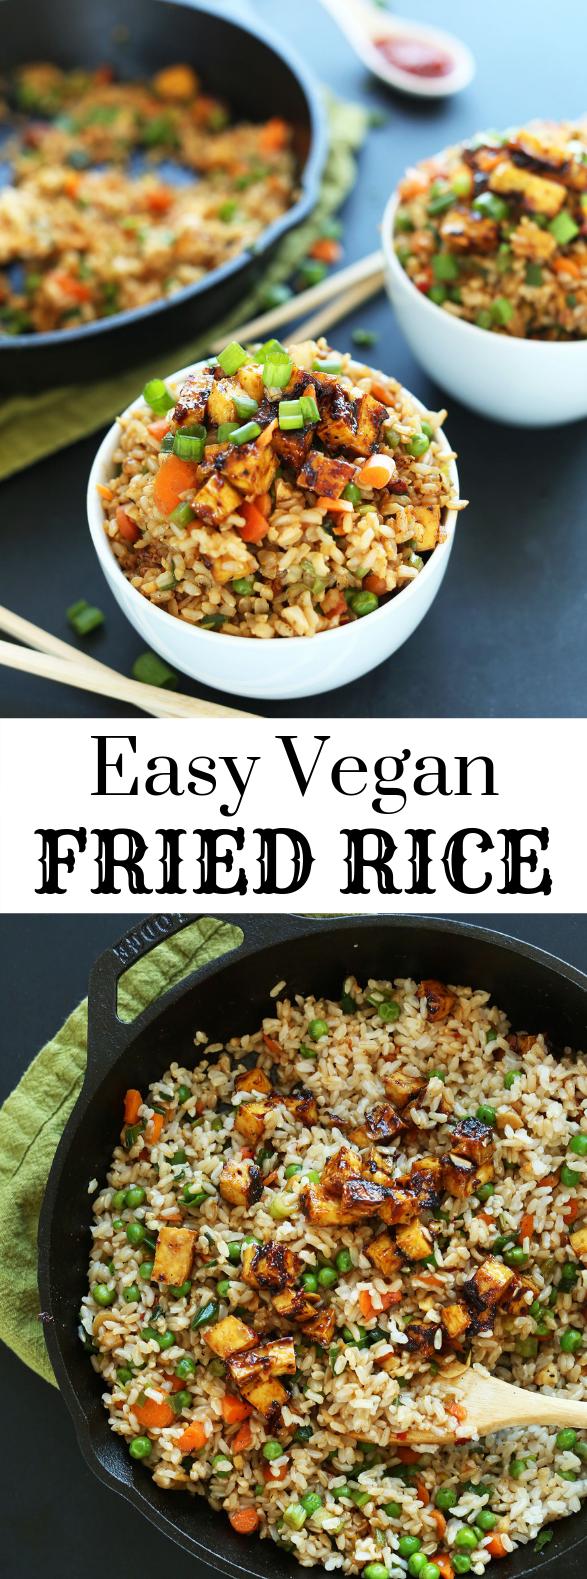 EASY VEGAN FRIED RICE #Vegetarian #Recipes